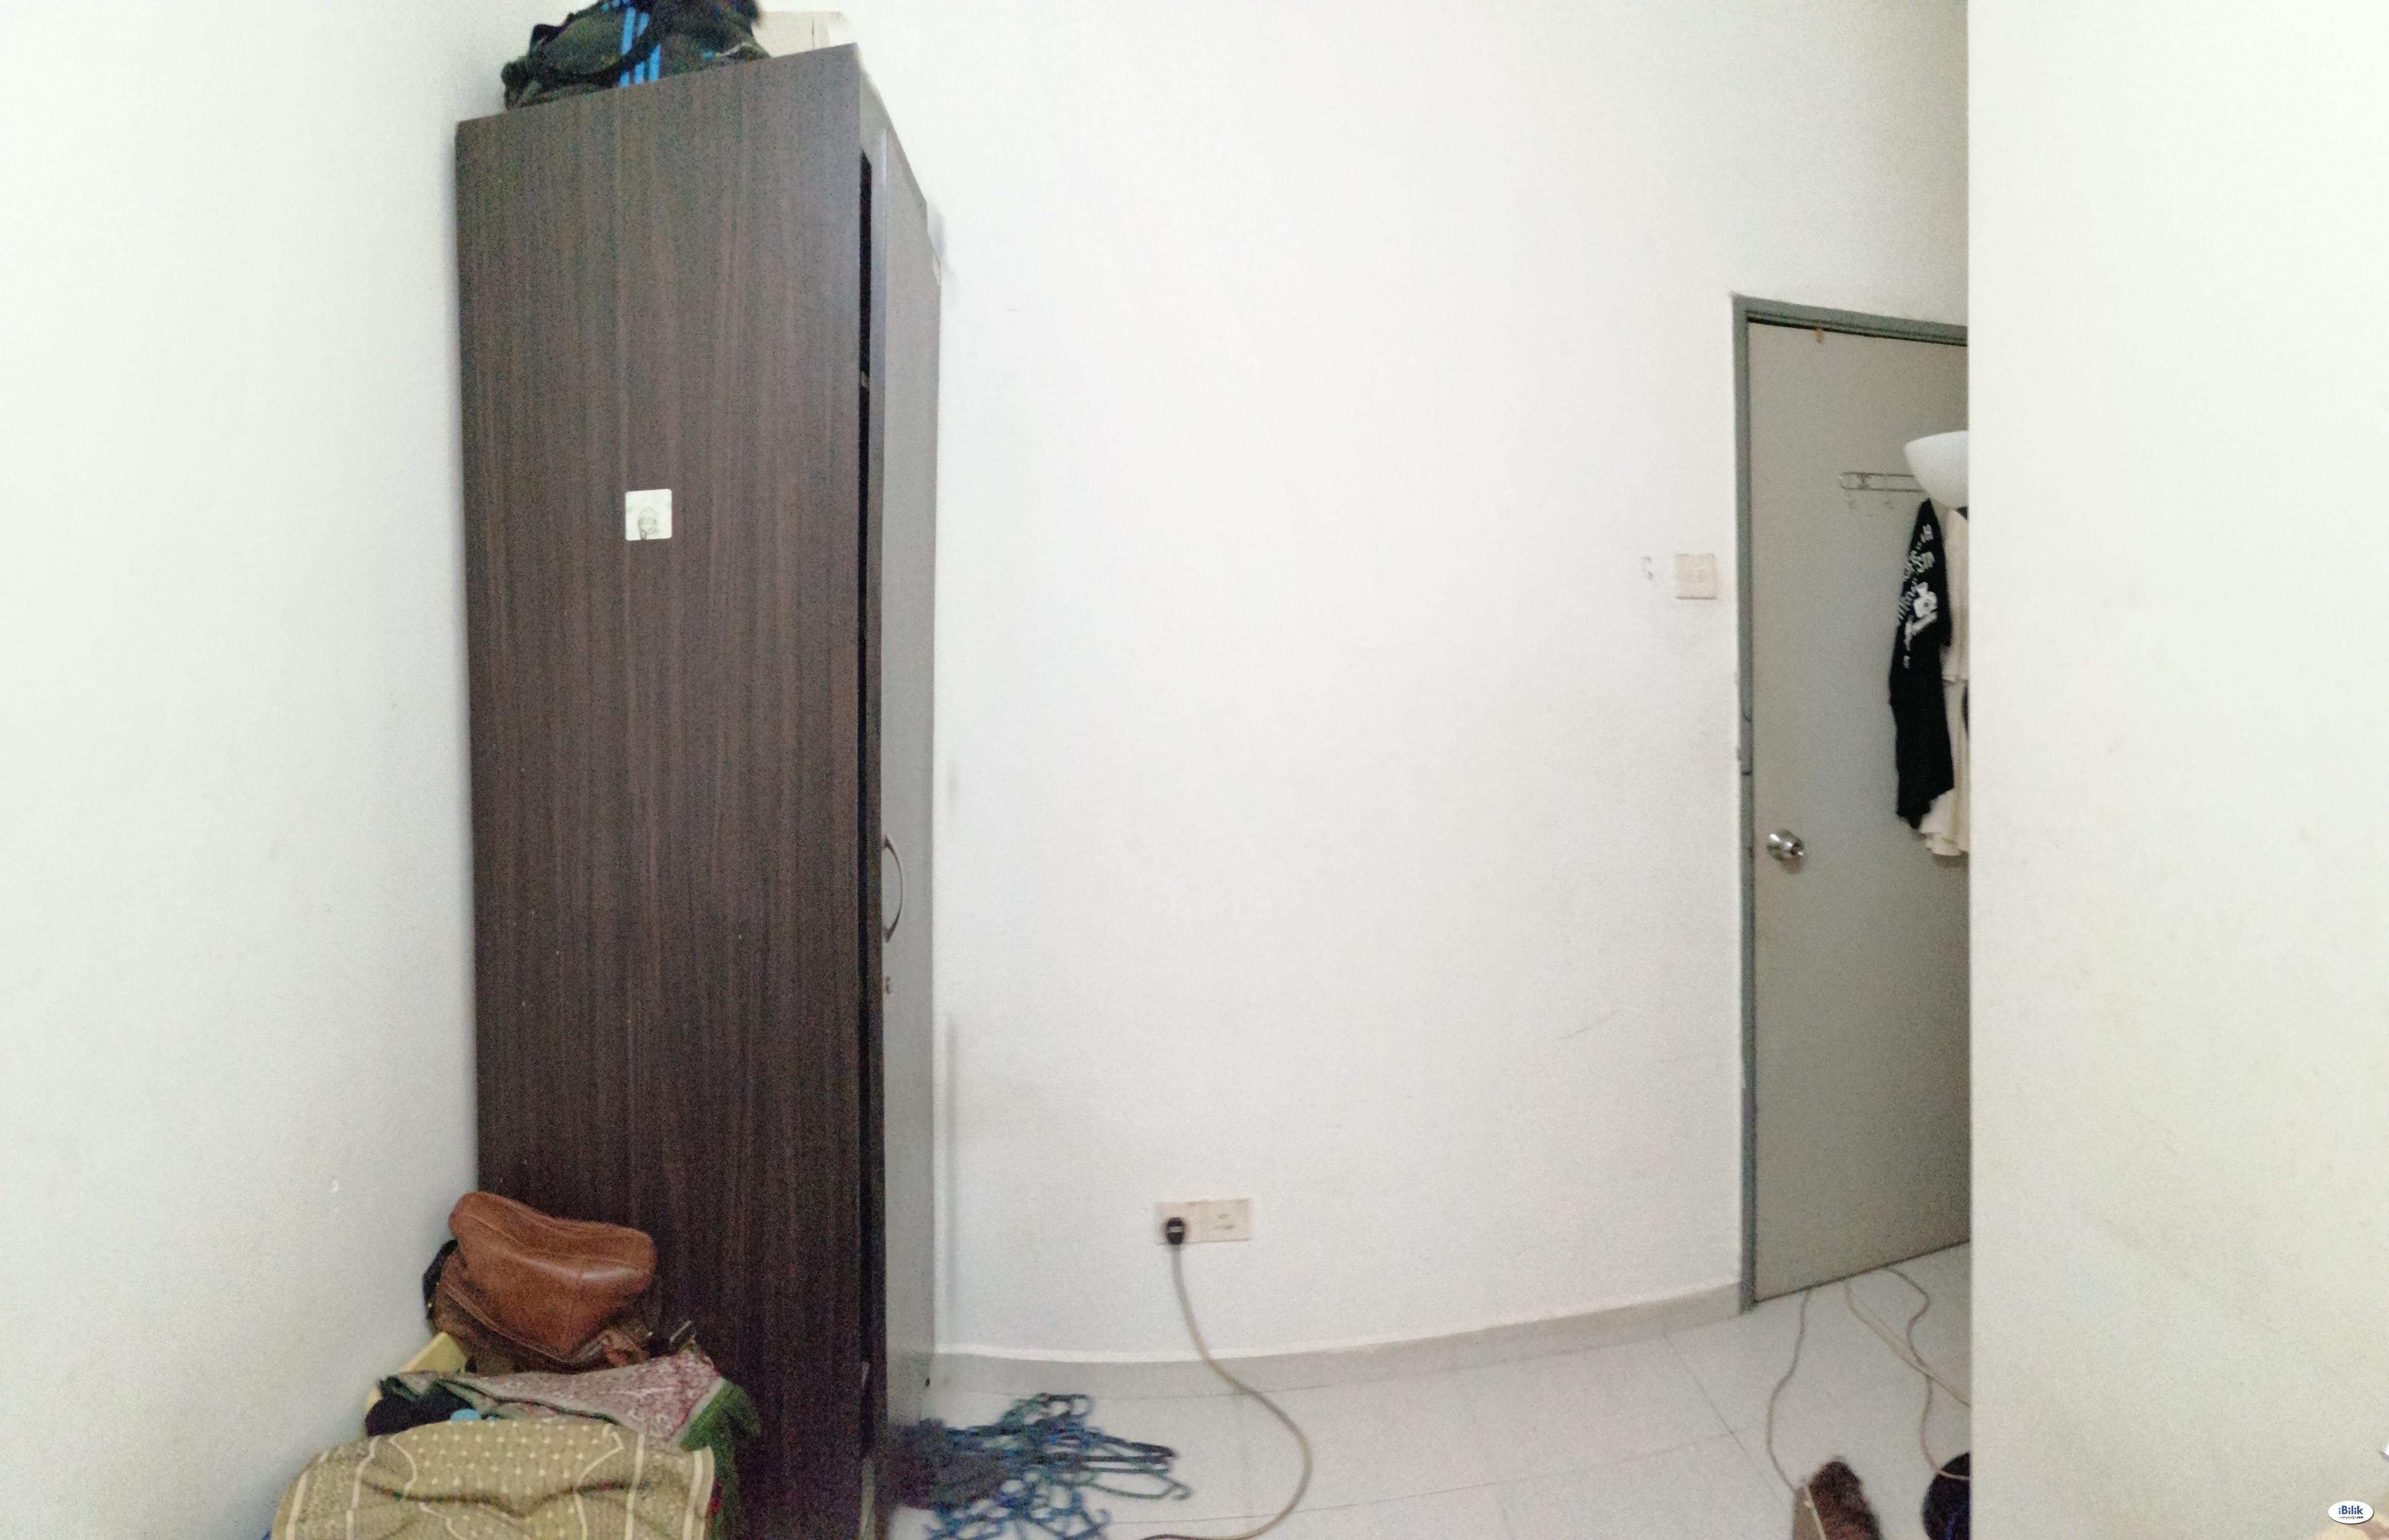 Middle Room at South City Plaza, Seri Kembangan